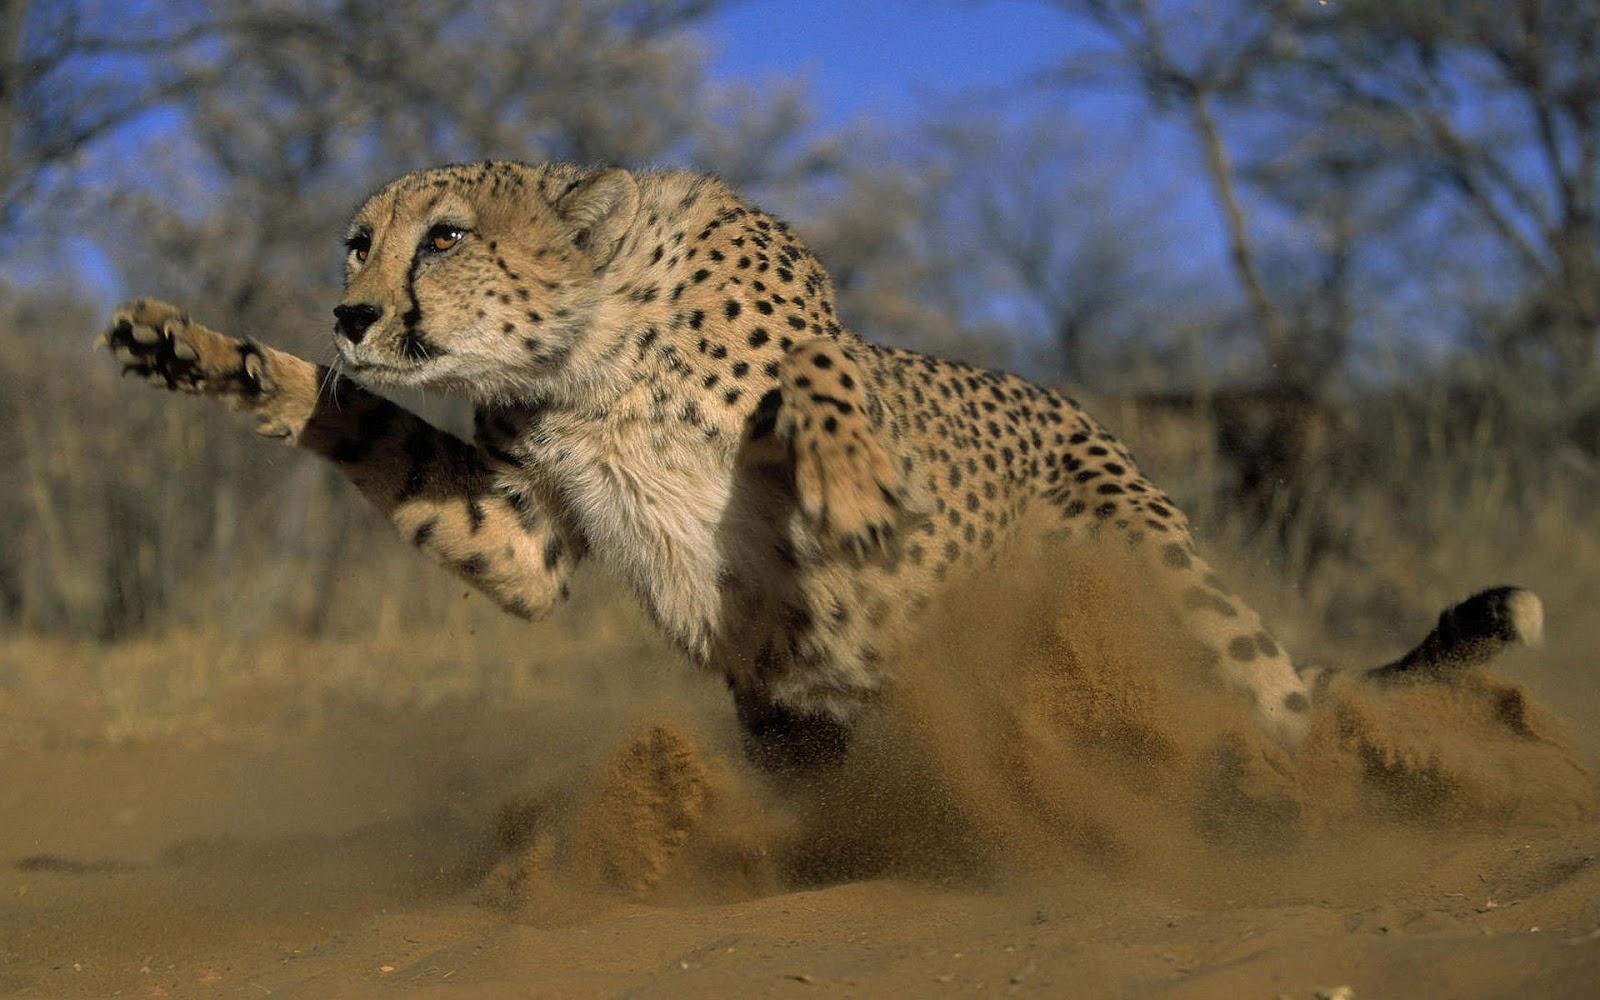 Cheetah Wallpaper 3d Cheetah Picturs Hd Desktop Wallpapers 4k Hd